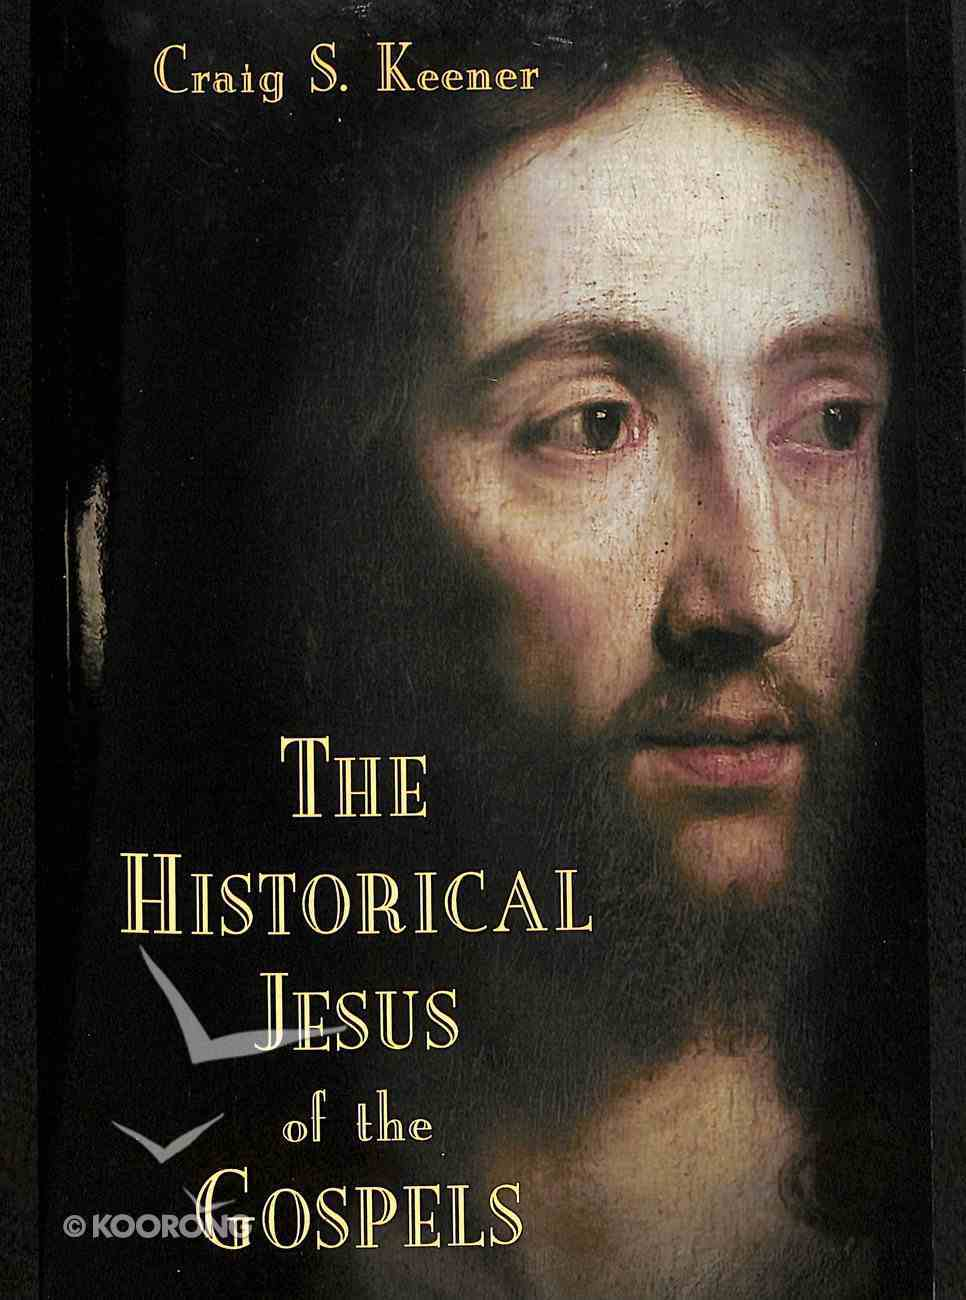 The Historical Jesus of the Gospels Paperback